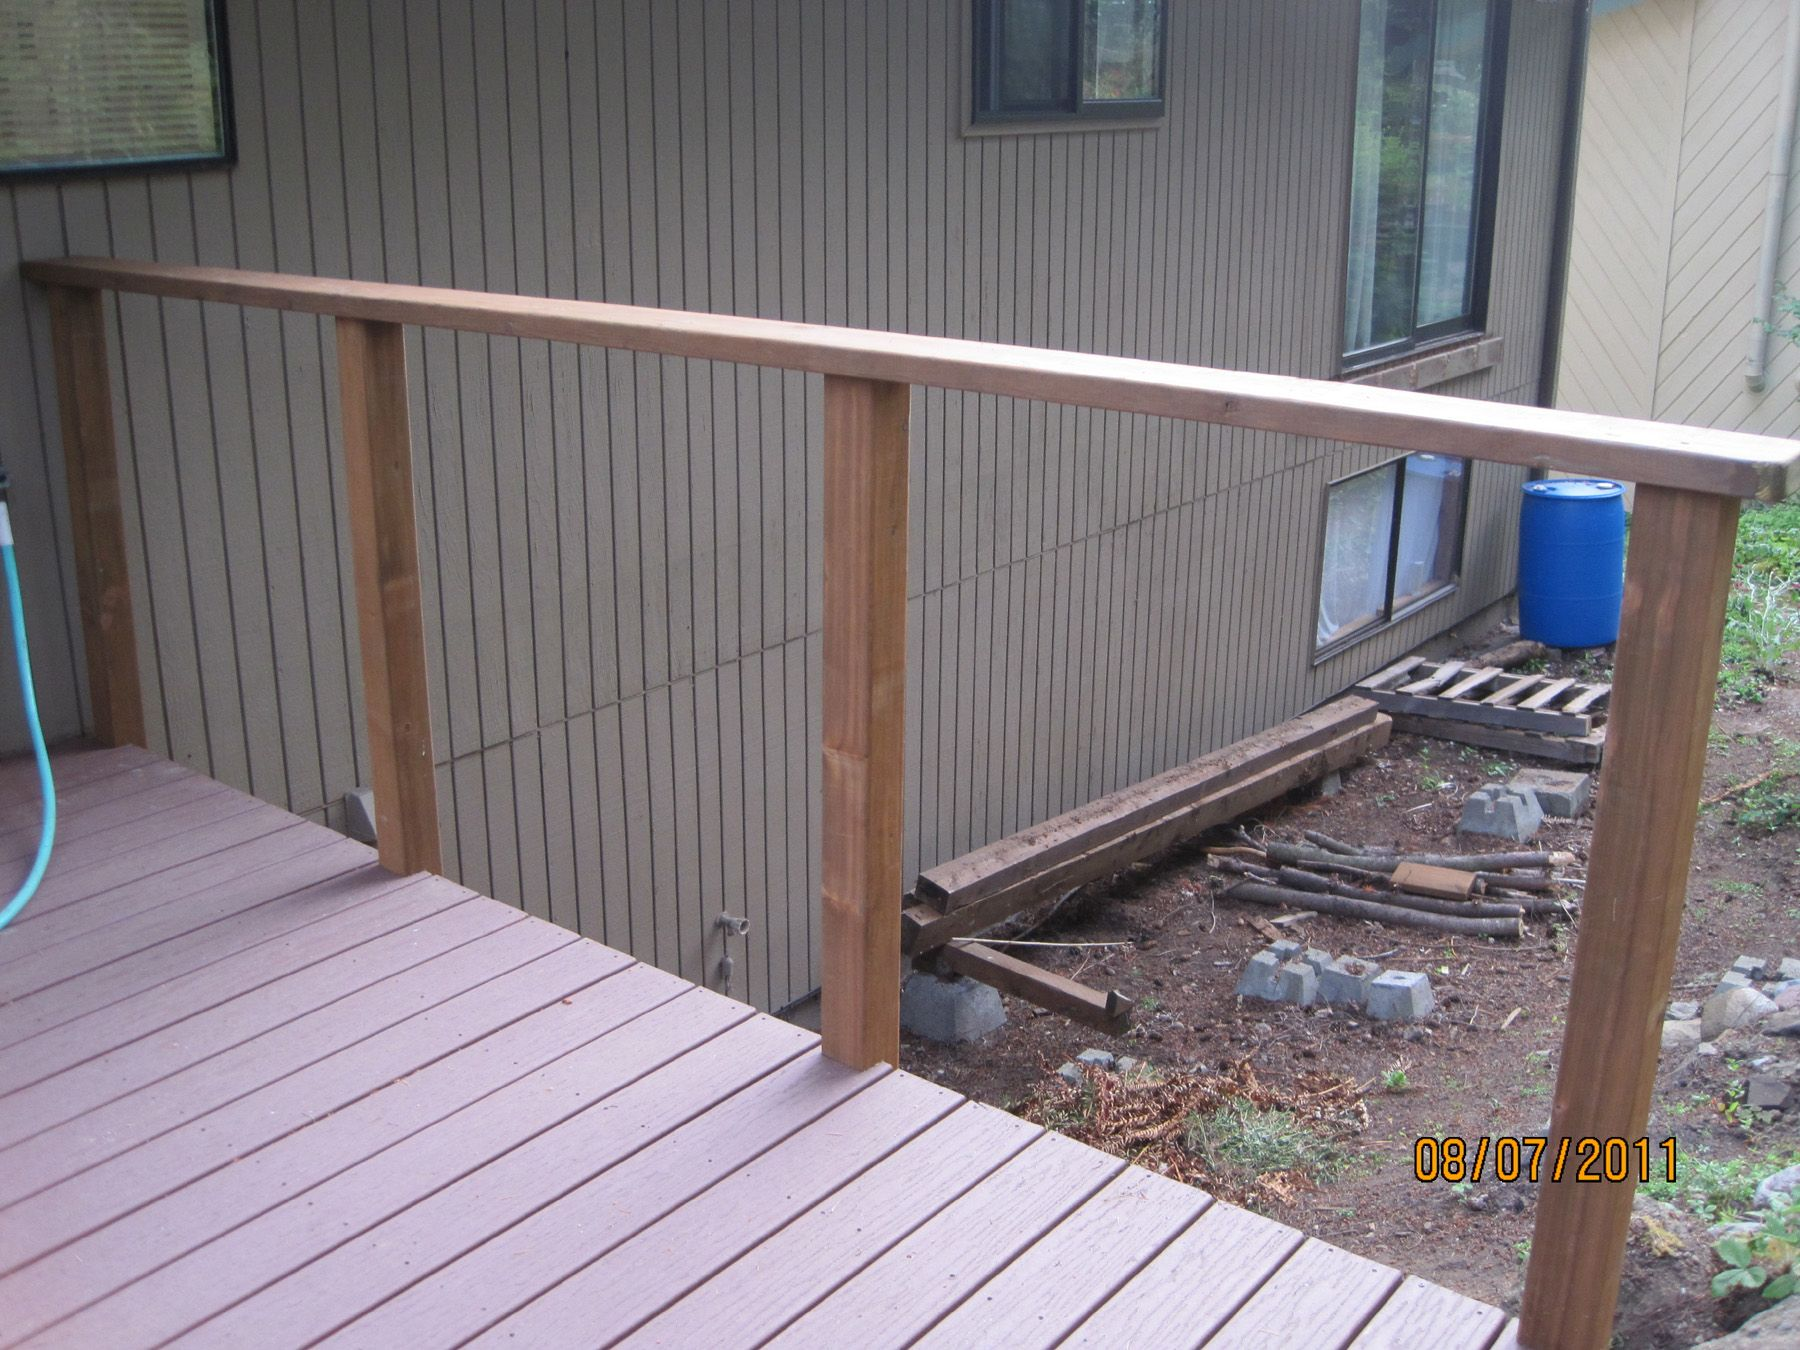 Deck railing posts 4x4 see 100s of deck railing ideas http deck railing posts 4x4 see 100s of deck railing ideas httpawoodrailing20141116100s of deck railing ideas designs deck railing ideas baanklon Images